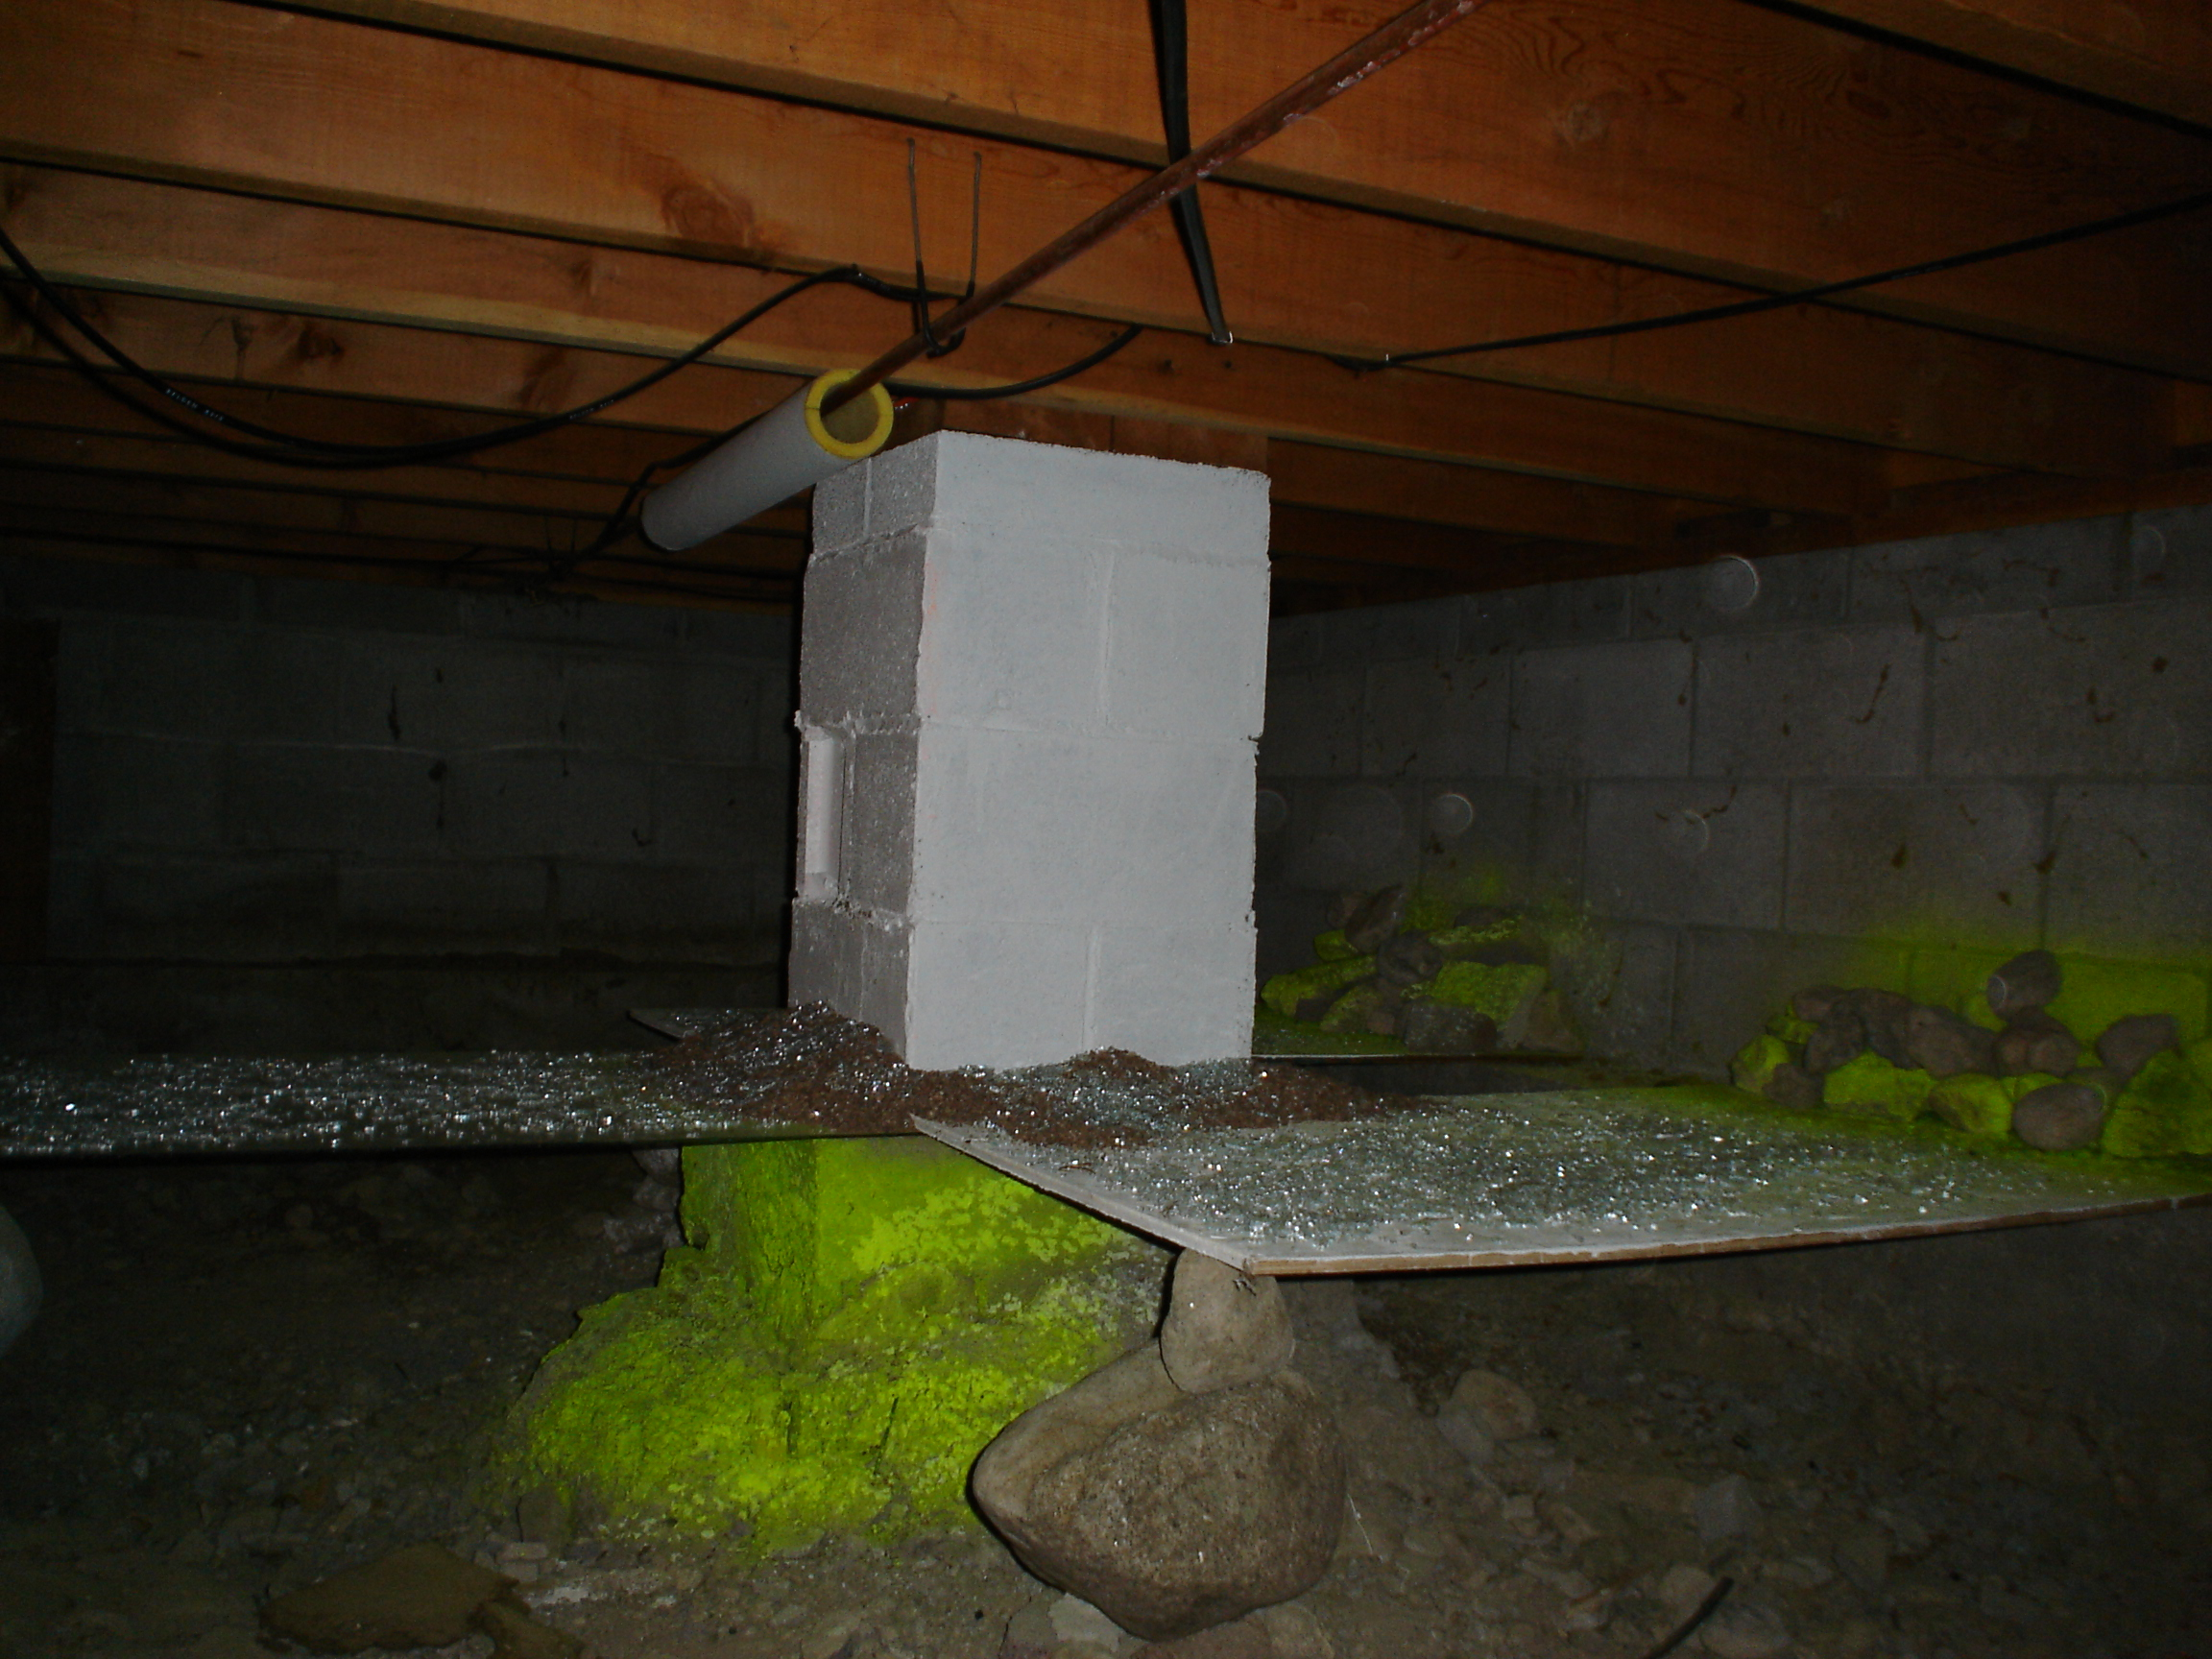 crawl space under apartment in Winter Park Colorado,  2006-07